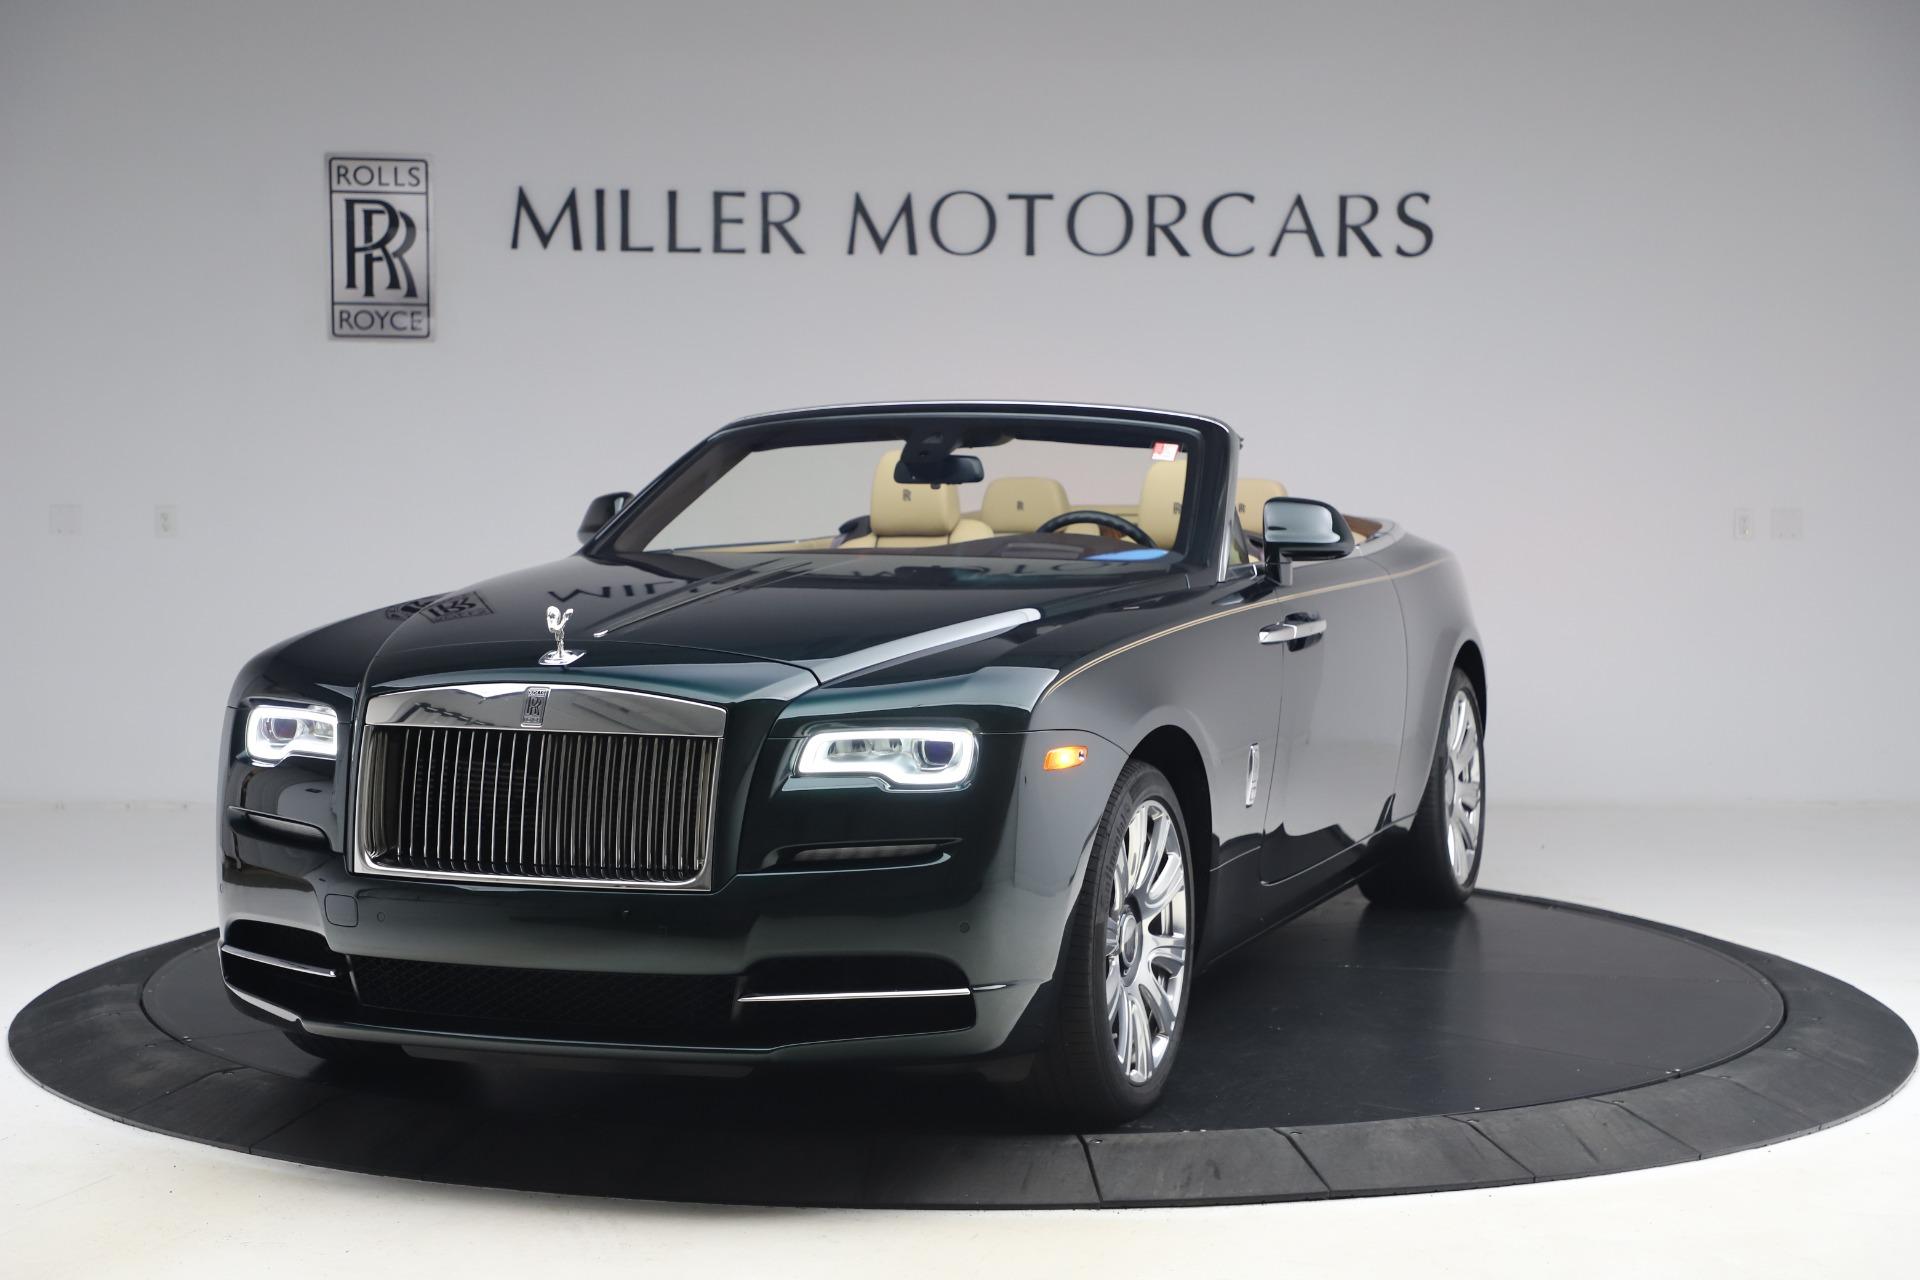 Used 2017 Rolls-Royce Dawn for sale $248,900 at Bugatti of Greenwich in Greenwich CT 06830 1